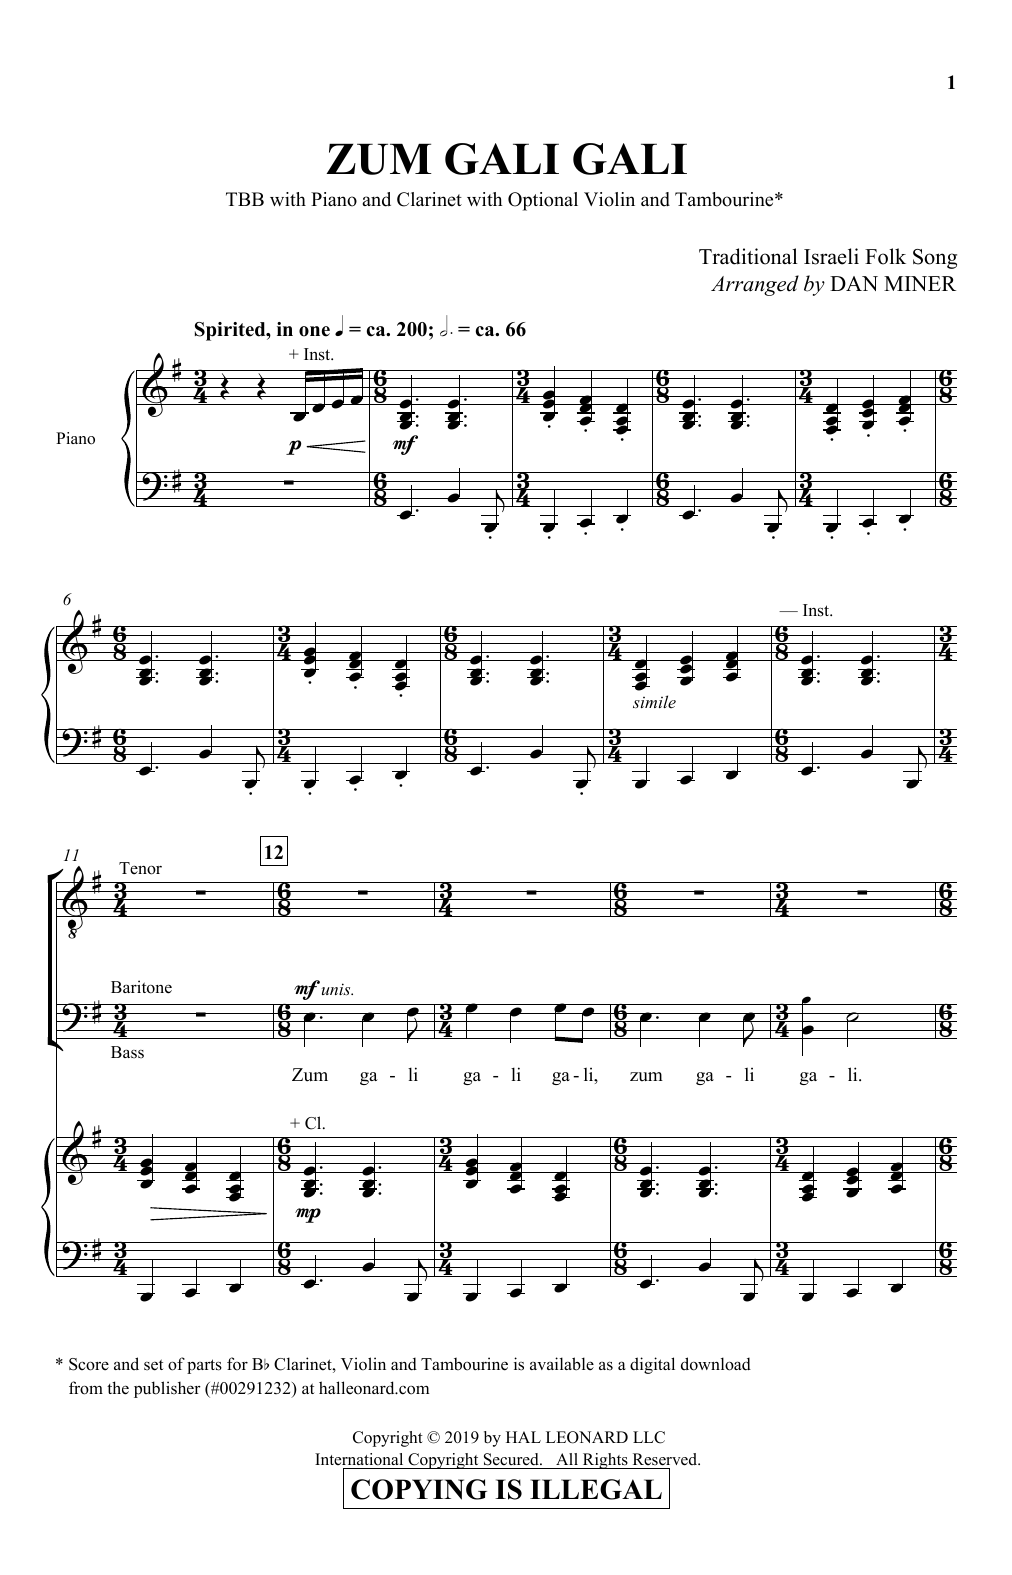 Dan Miner Zum Gali Gali sheet music notes and chords. Download Printable PDF.